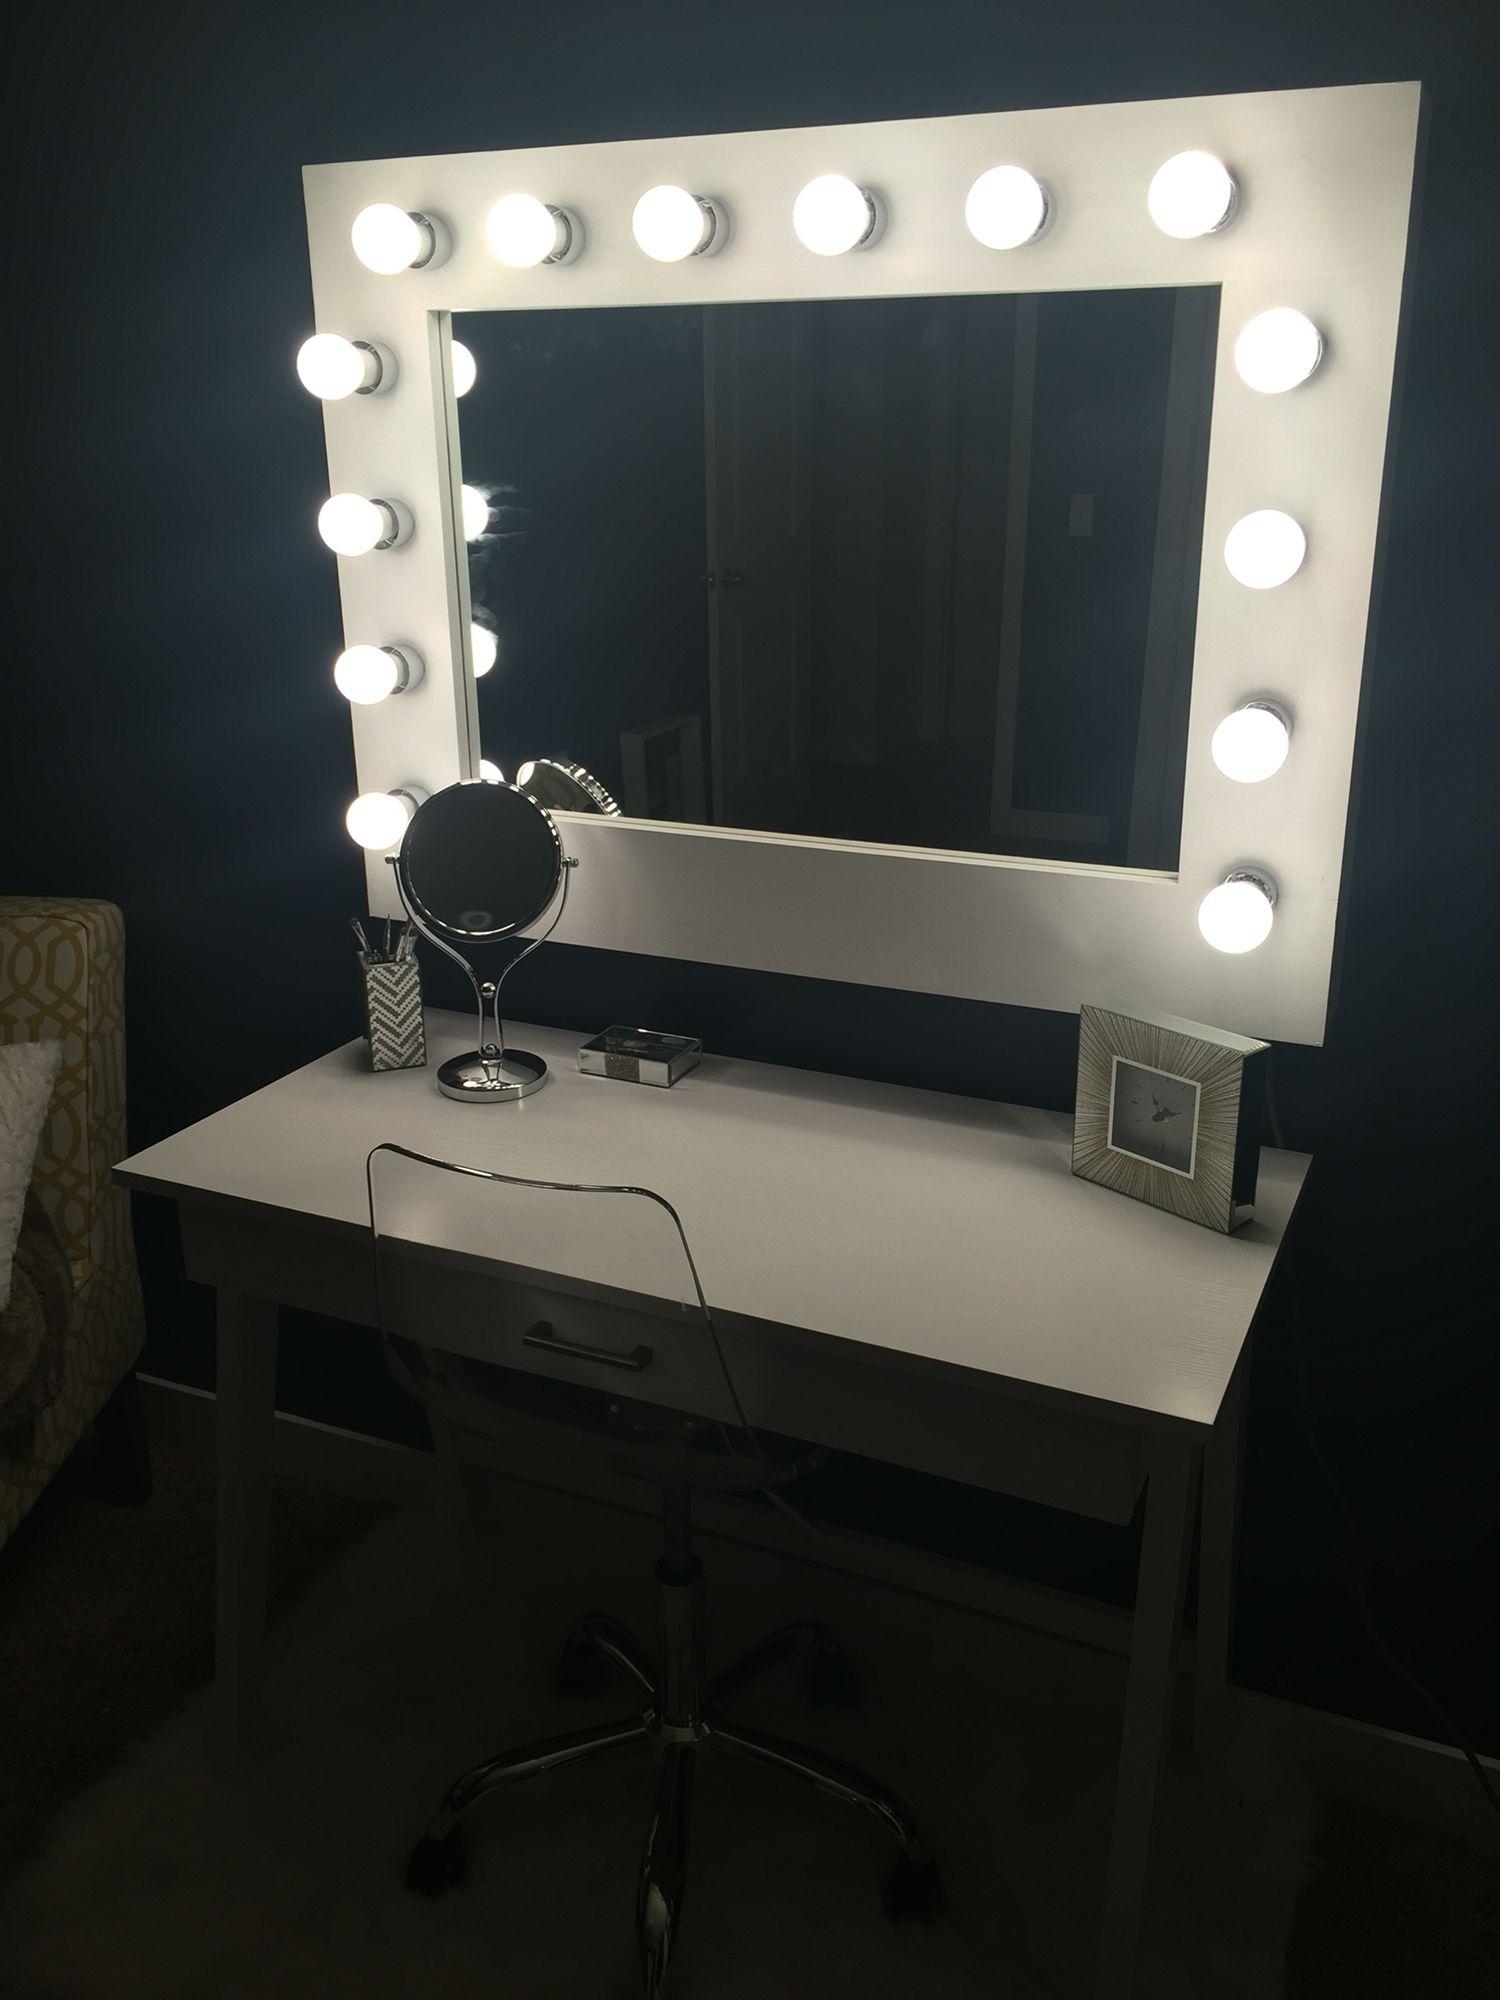 Diy Bulb Mirror Vanity Mirror Beauty Mirror Homemade With Love